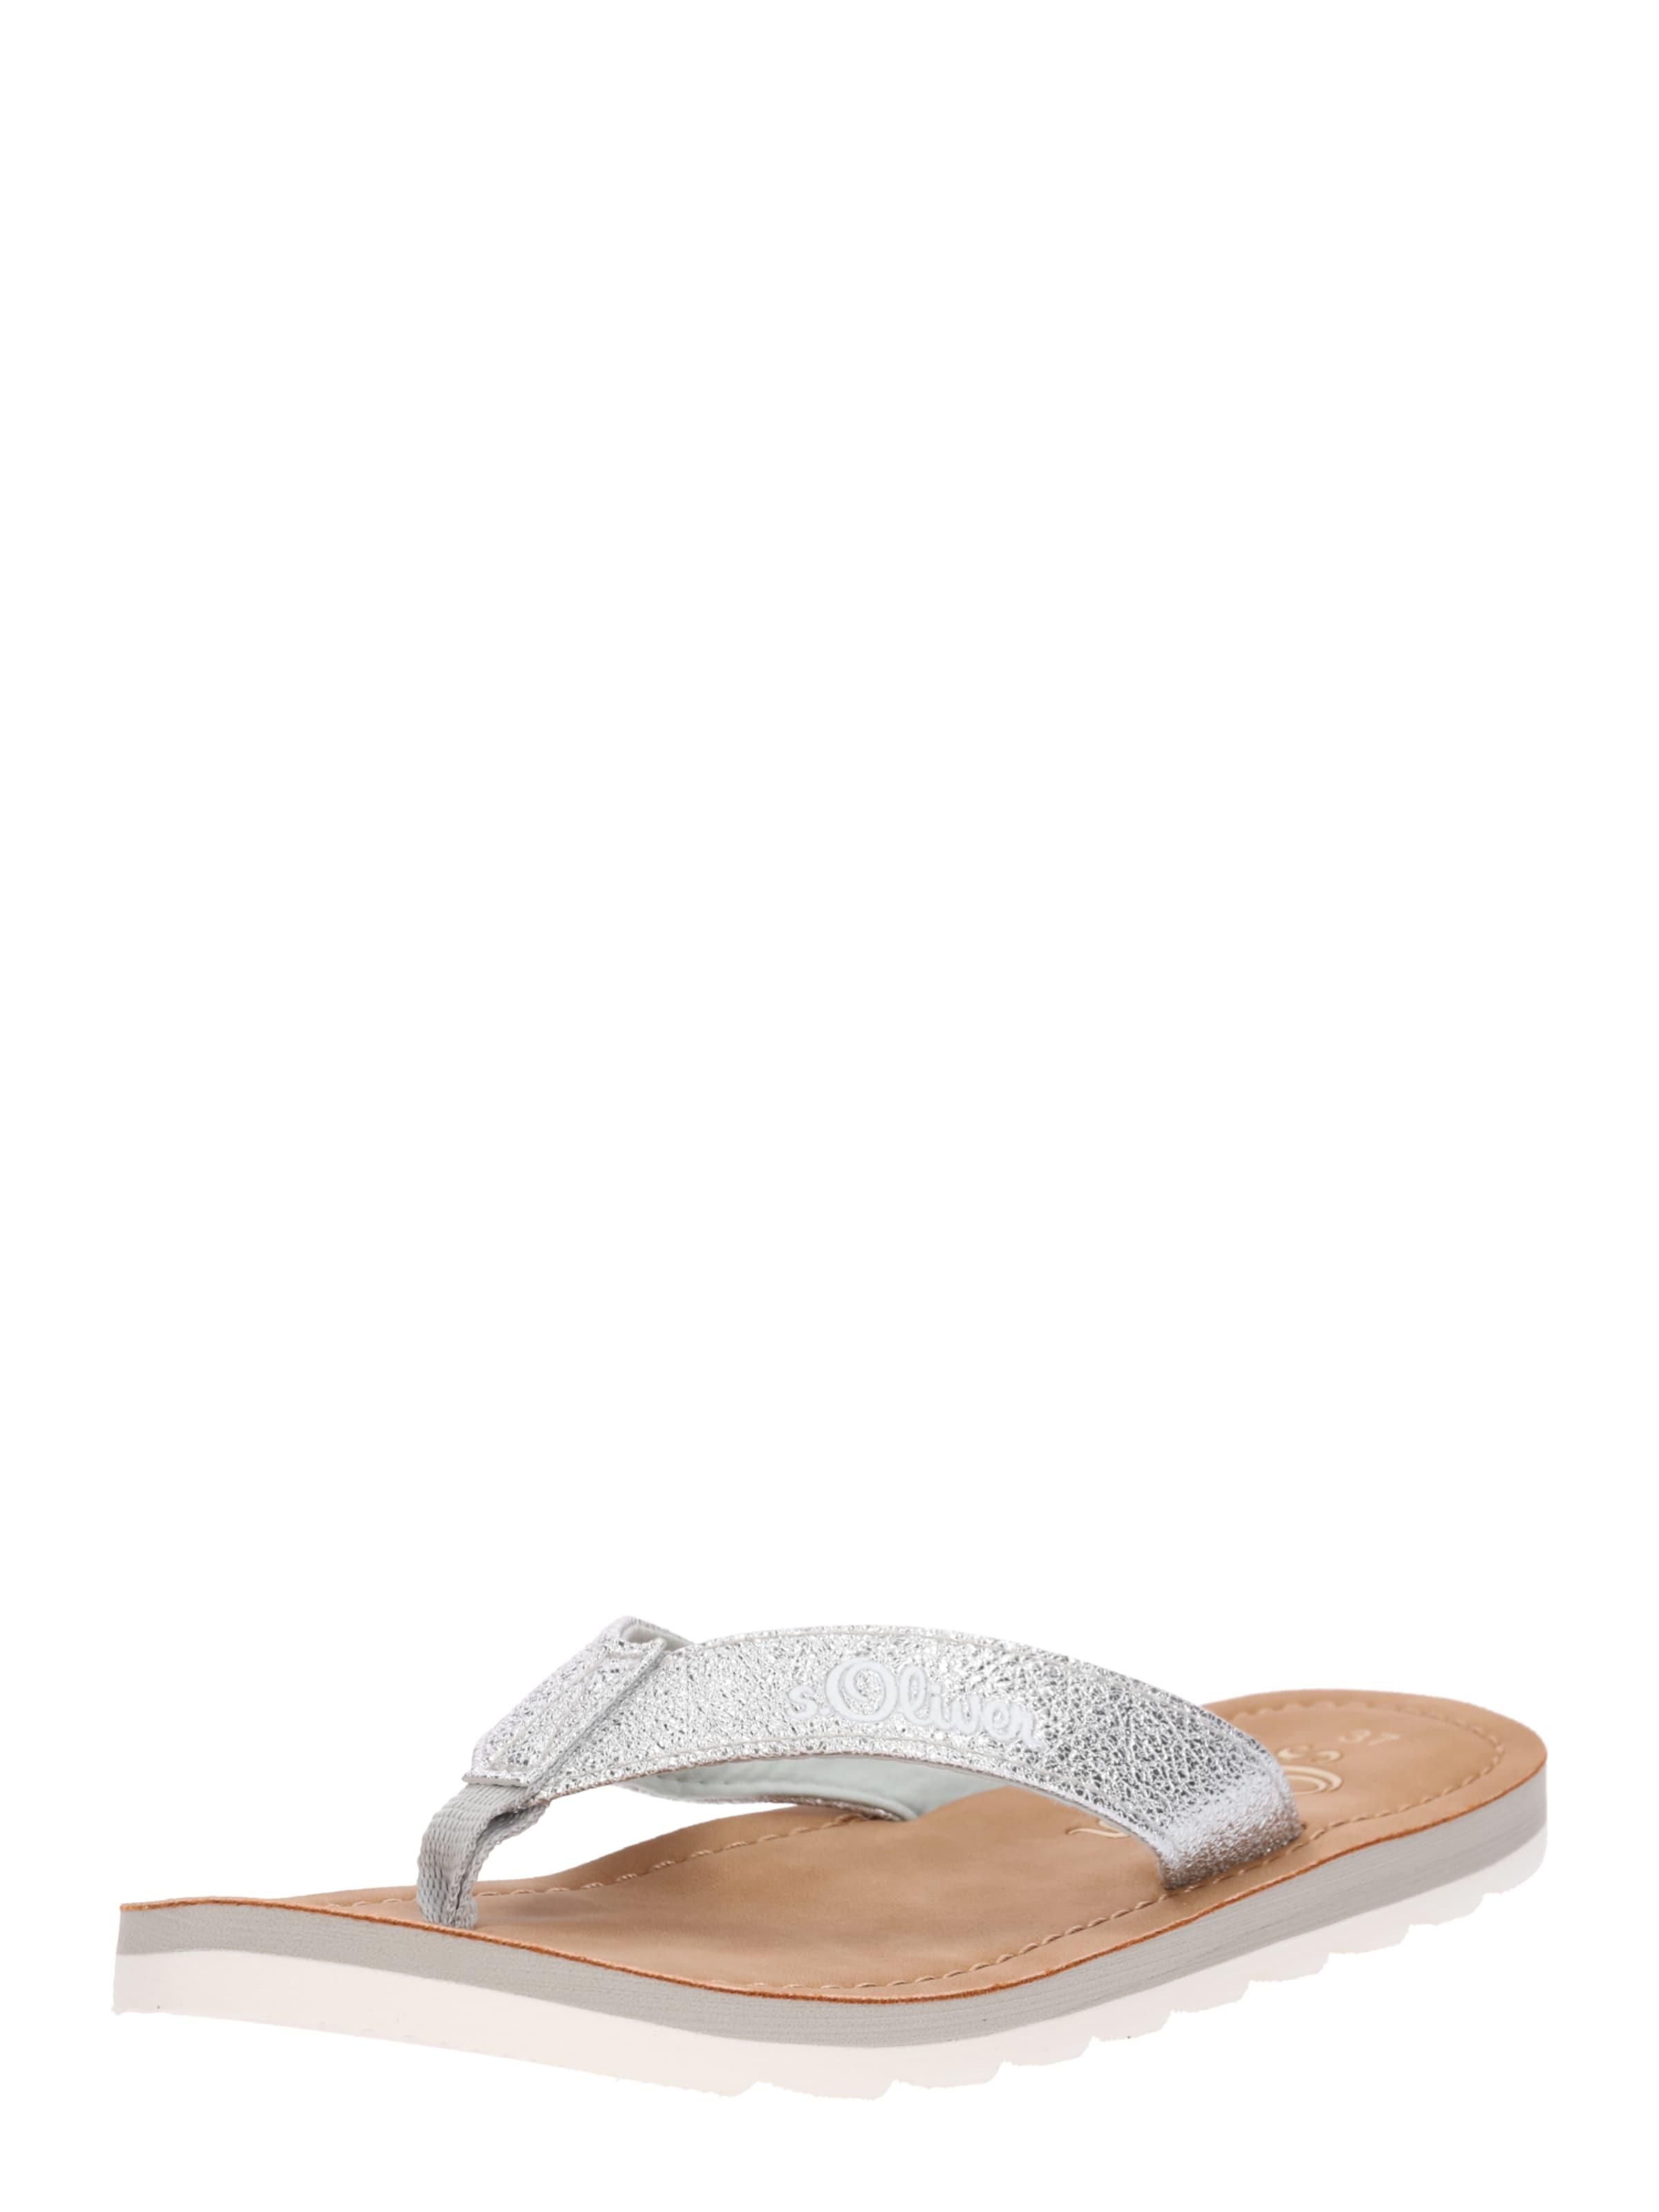 Haltbare Mode billige Schuhe s.Oliver RED LABEL | Zehentrennersandale Schuhe Gut getragene Schuhe